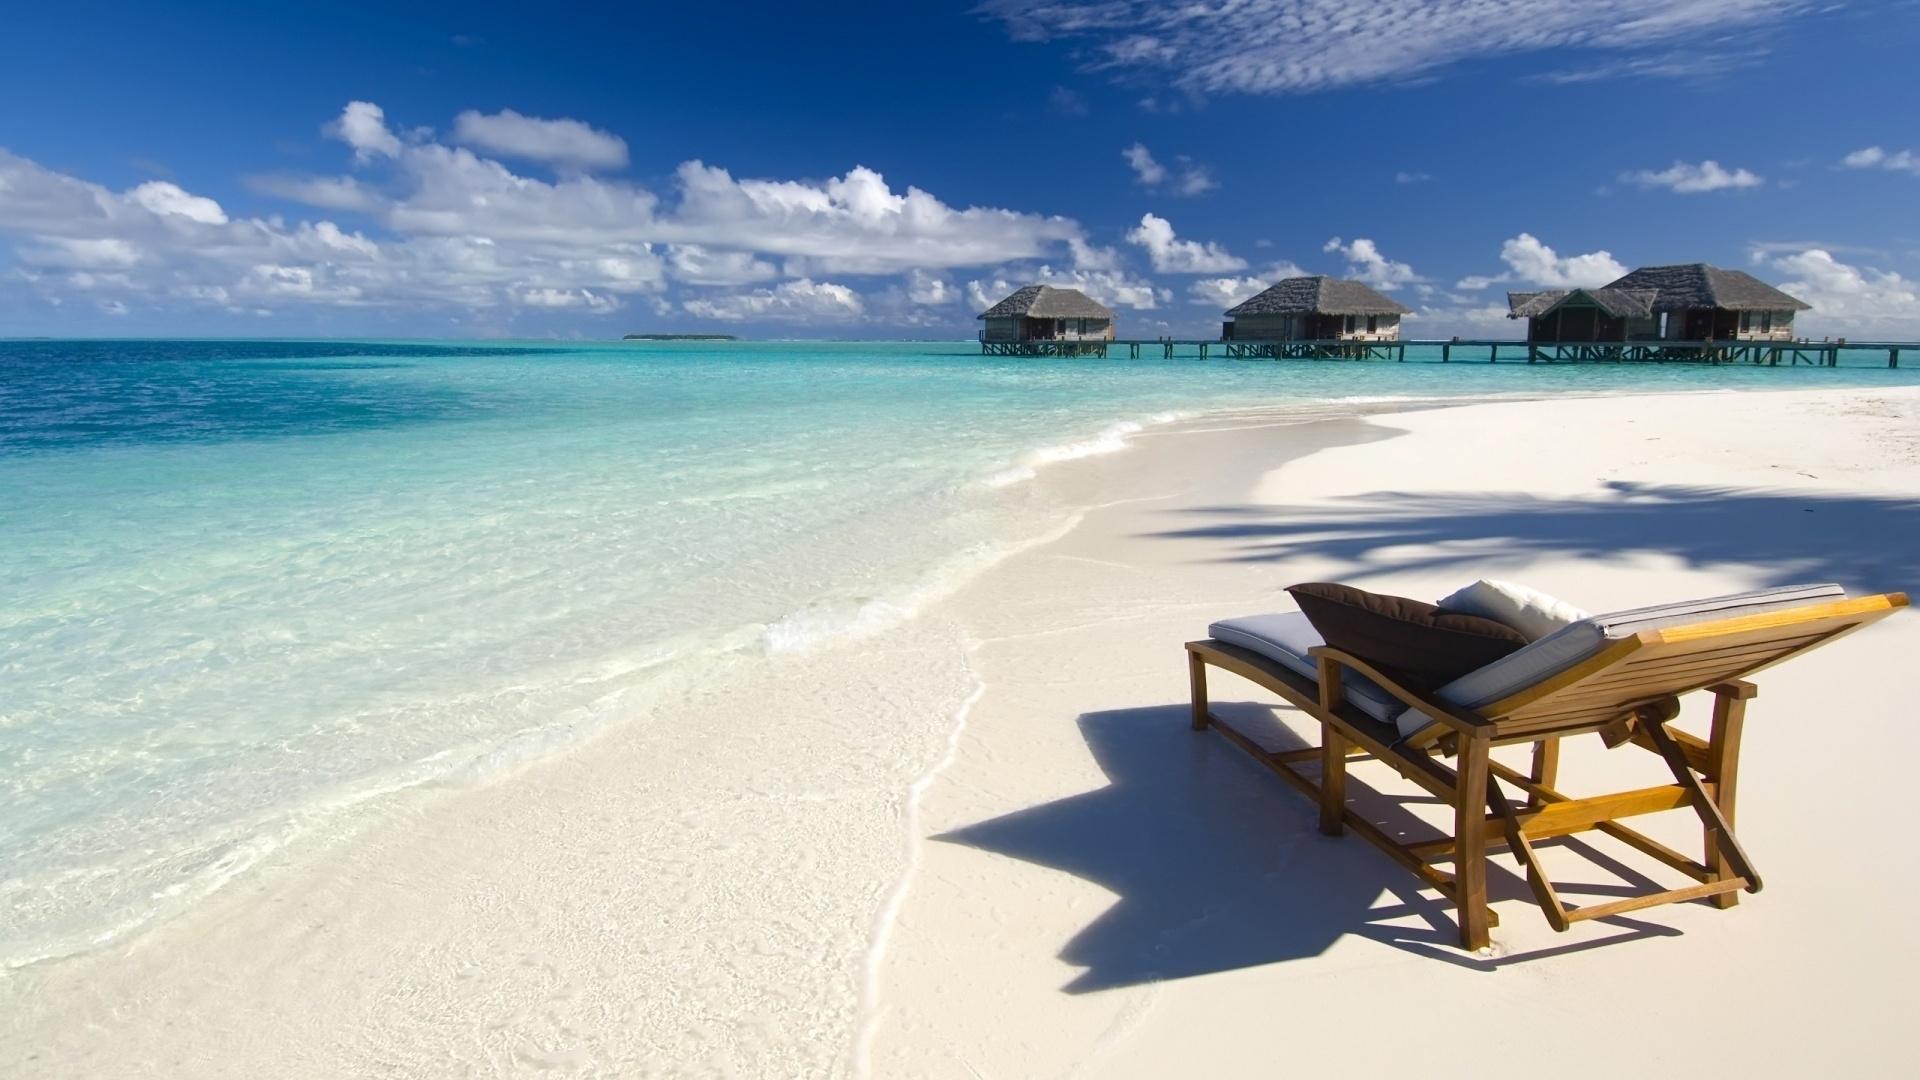 Wallpaper Beach Sea Tropics Chair Pillows Bungalow